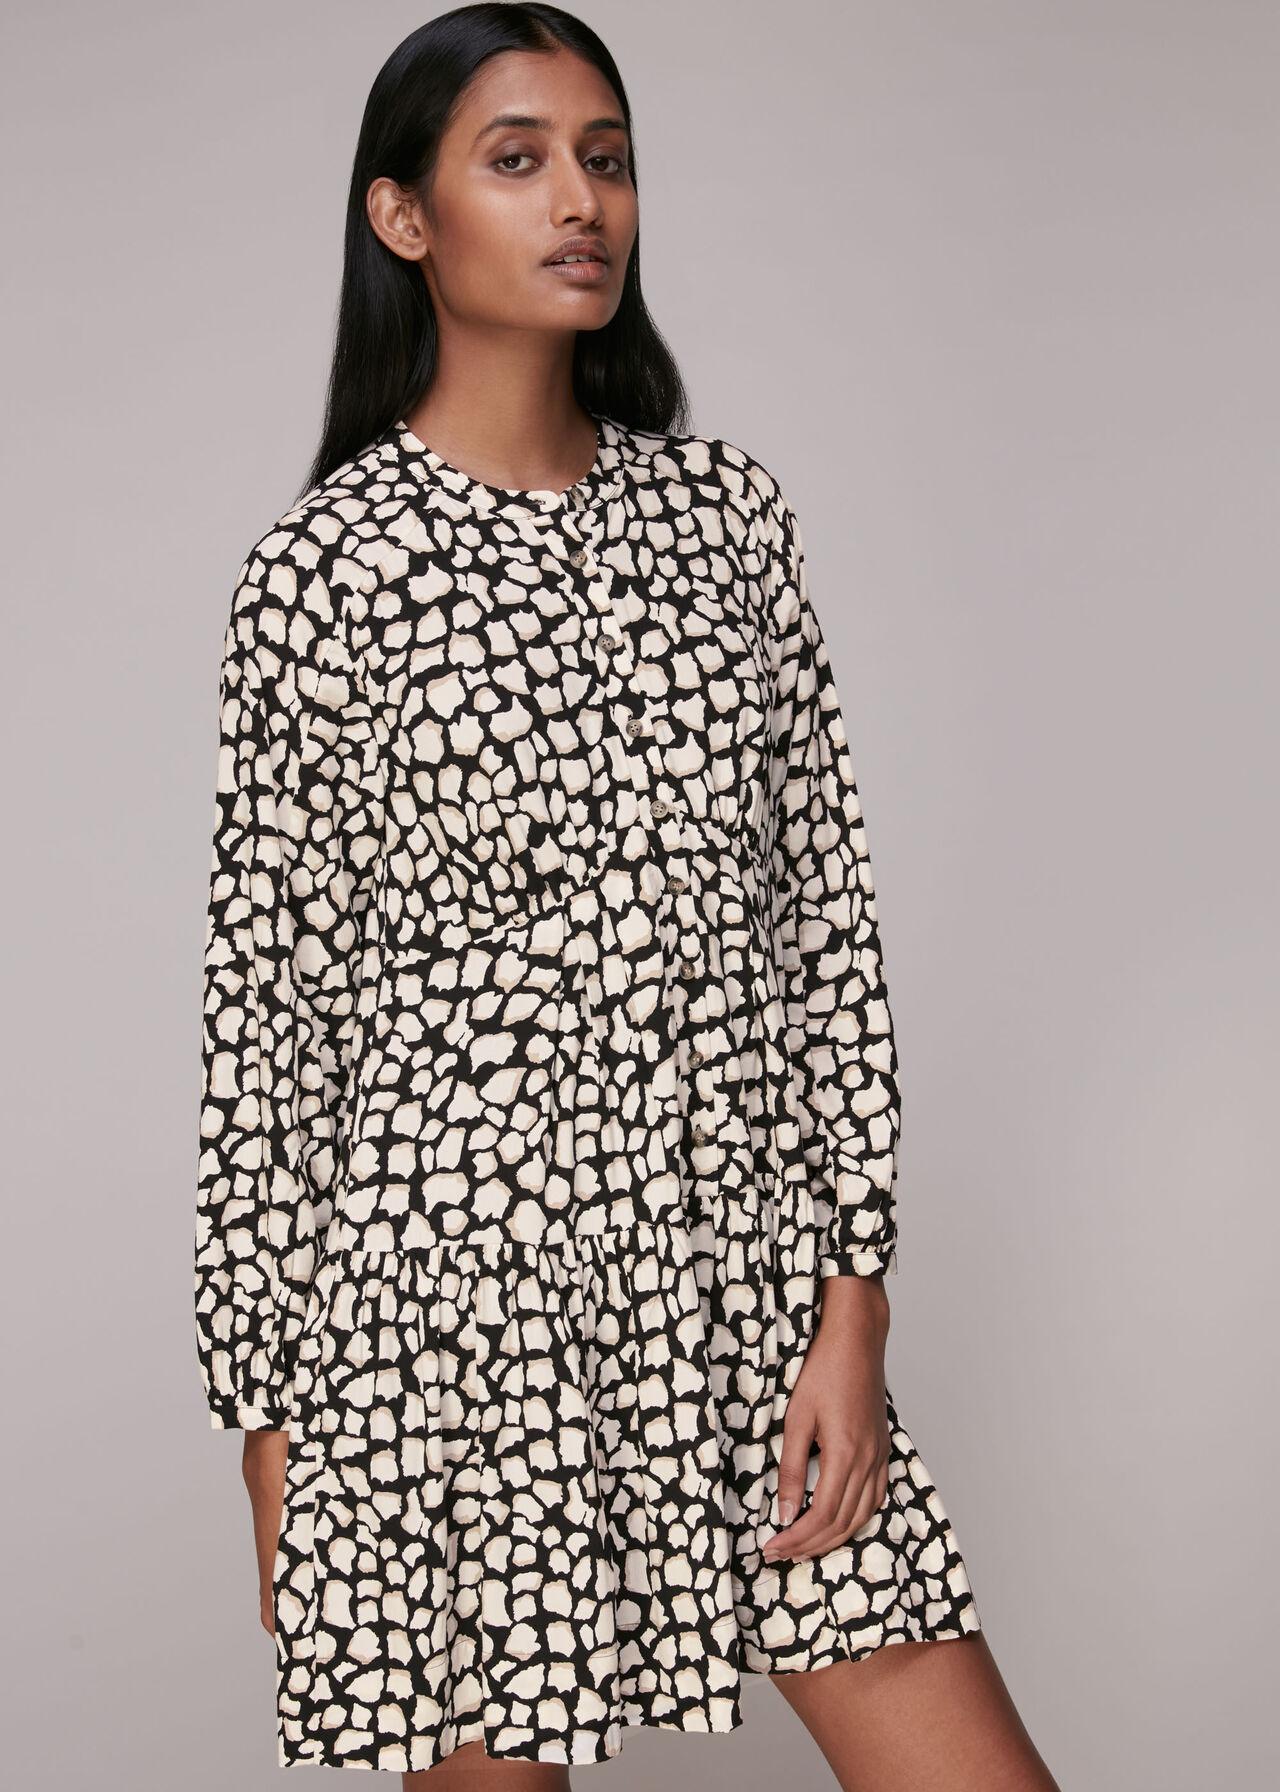 Giraffe Print Trapeze Dress